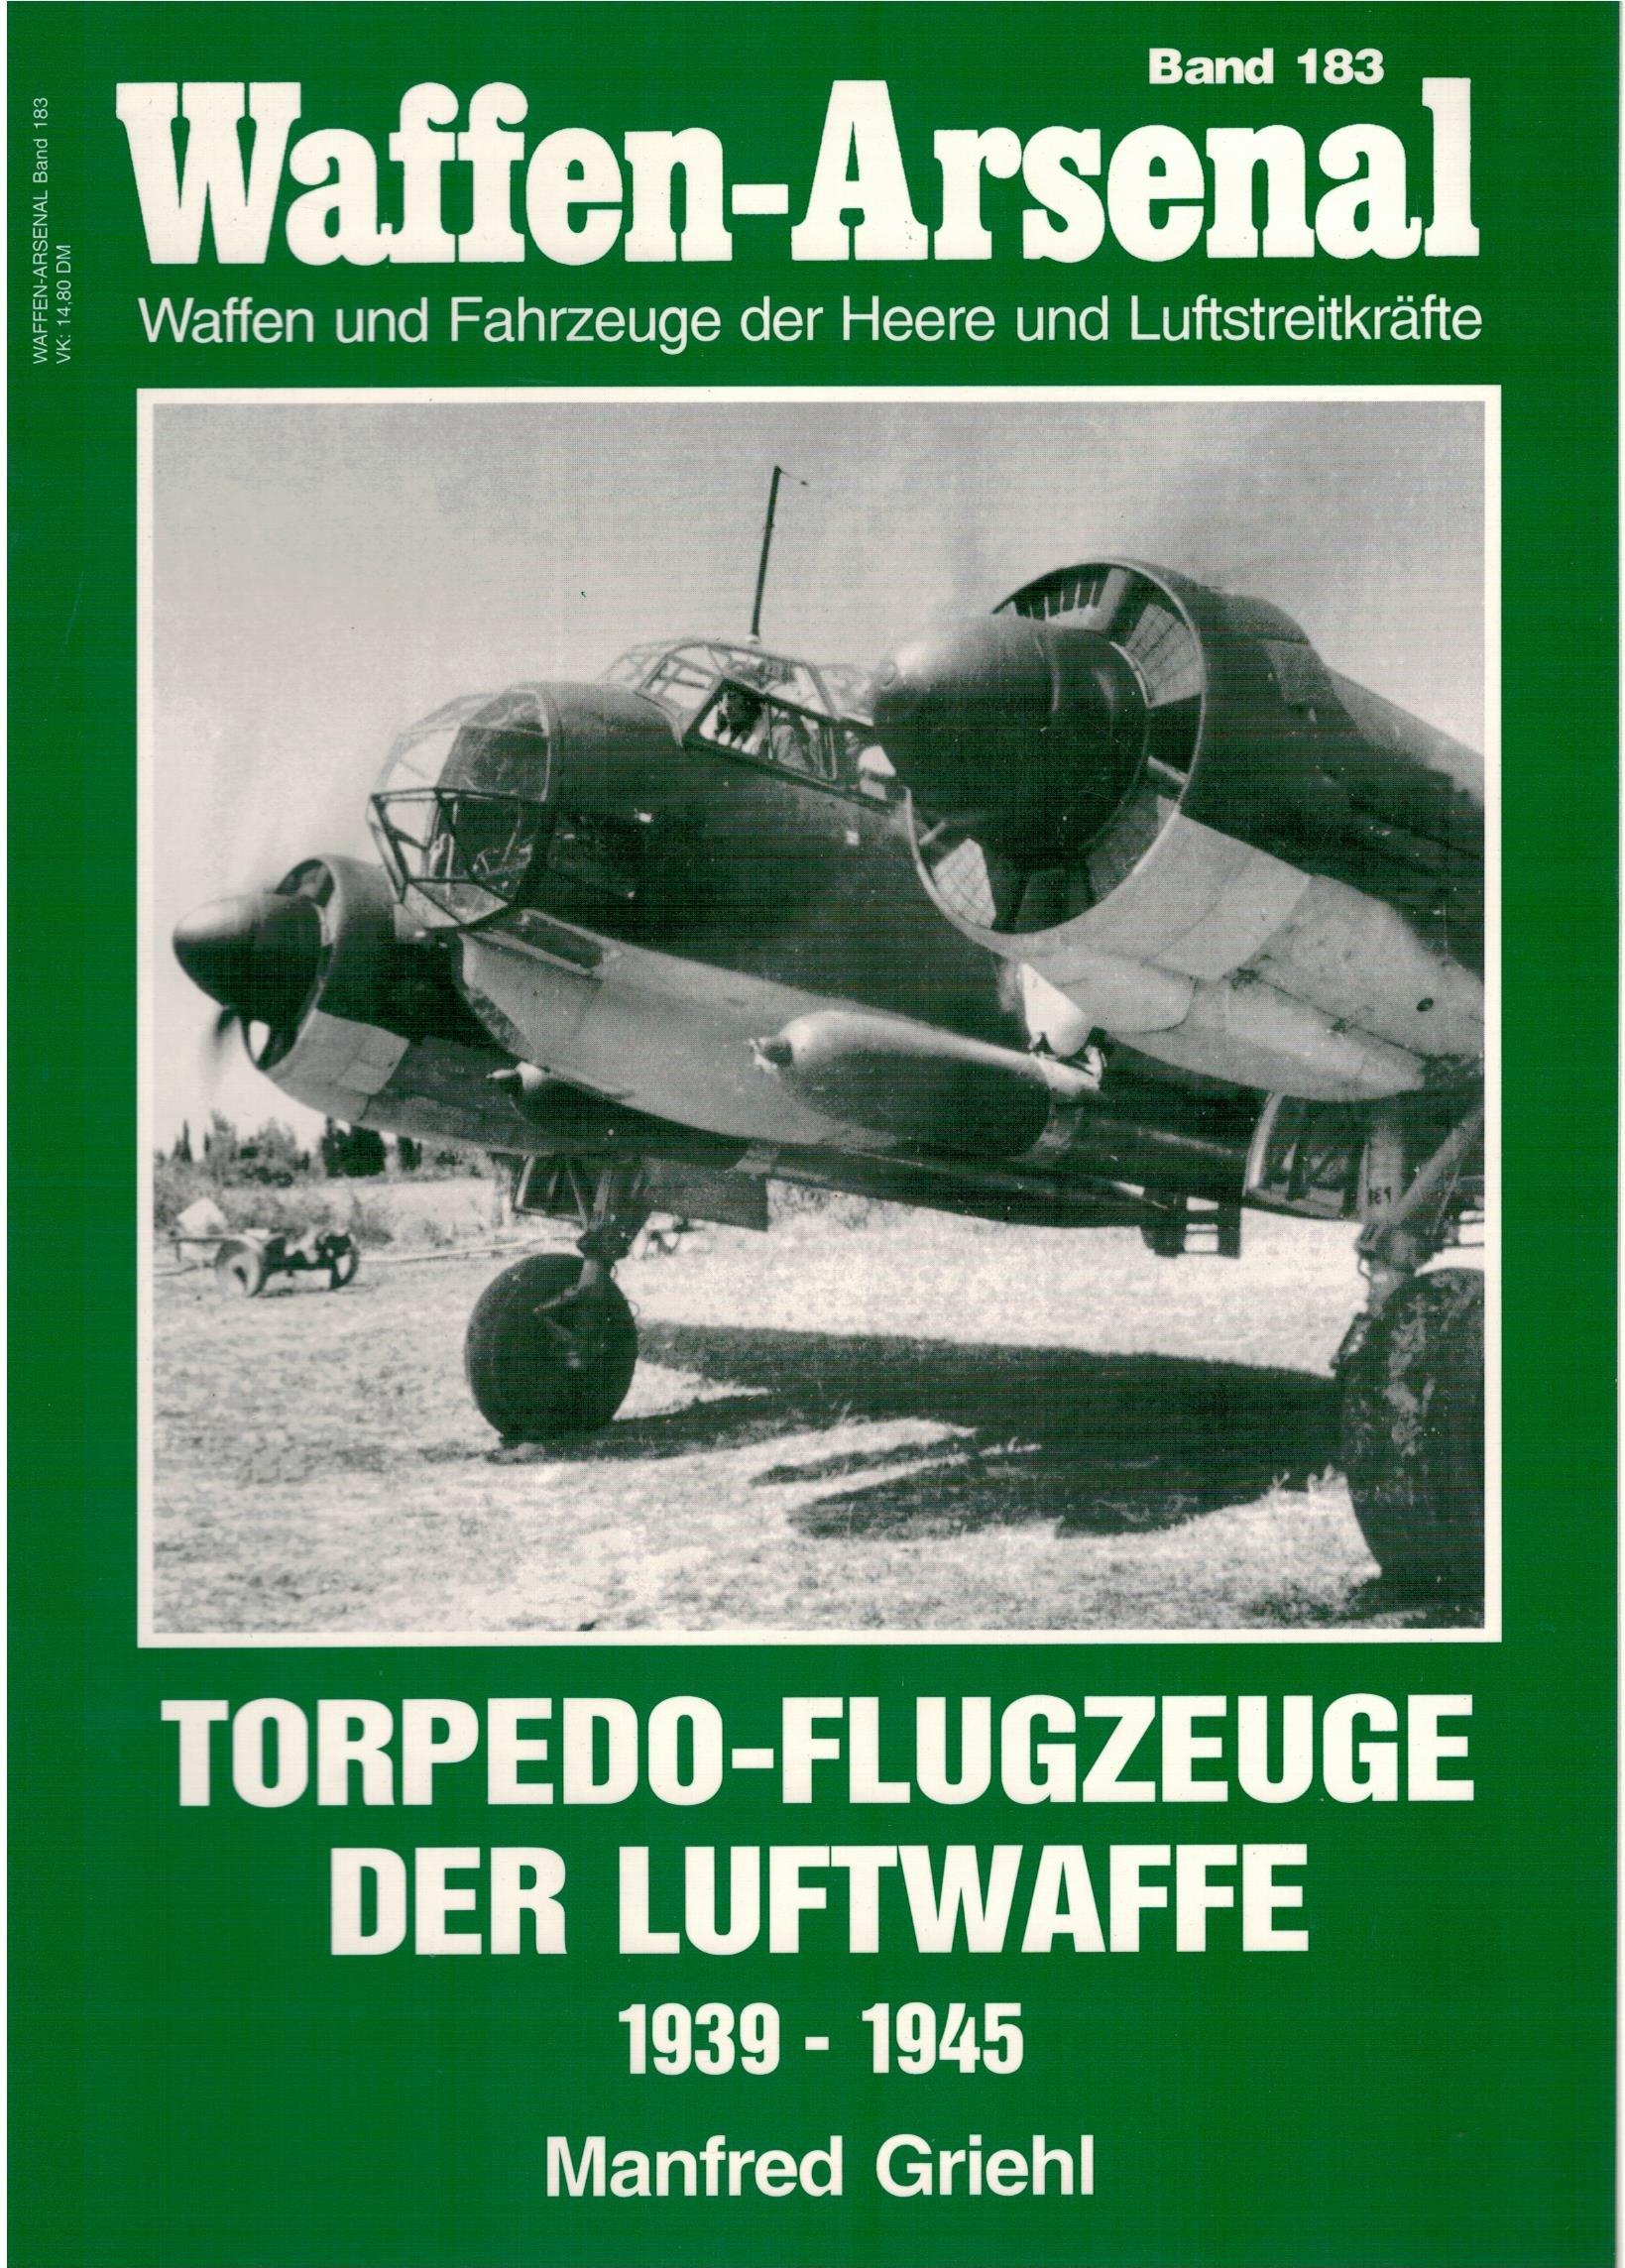 Waffen-Arsenal Band 183. Torpedo-Flugzeuge der Luftwaffe 1939-1945